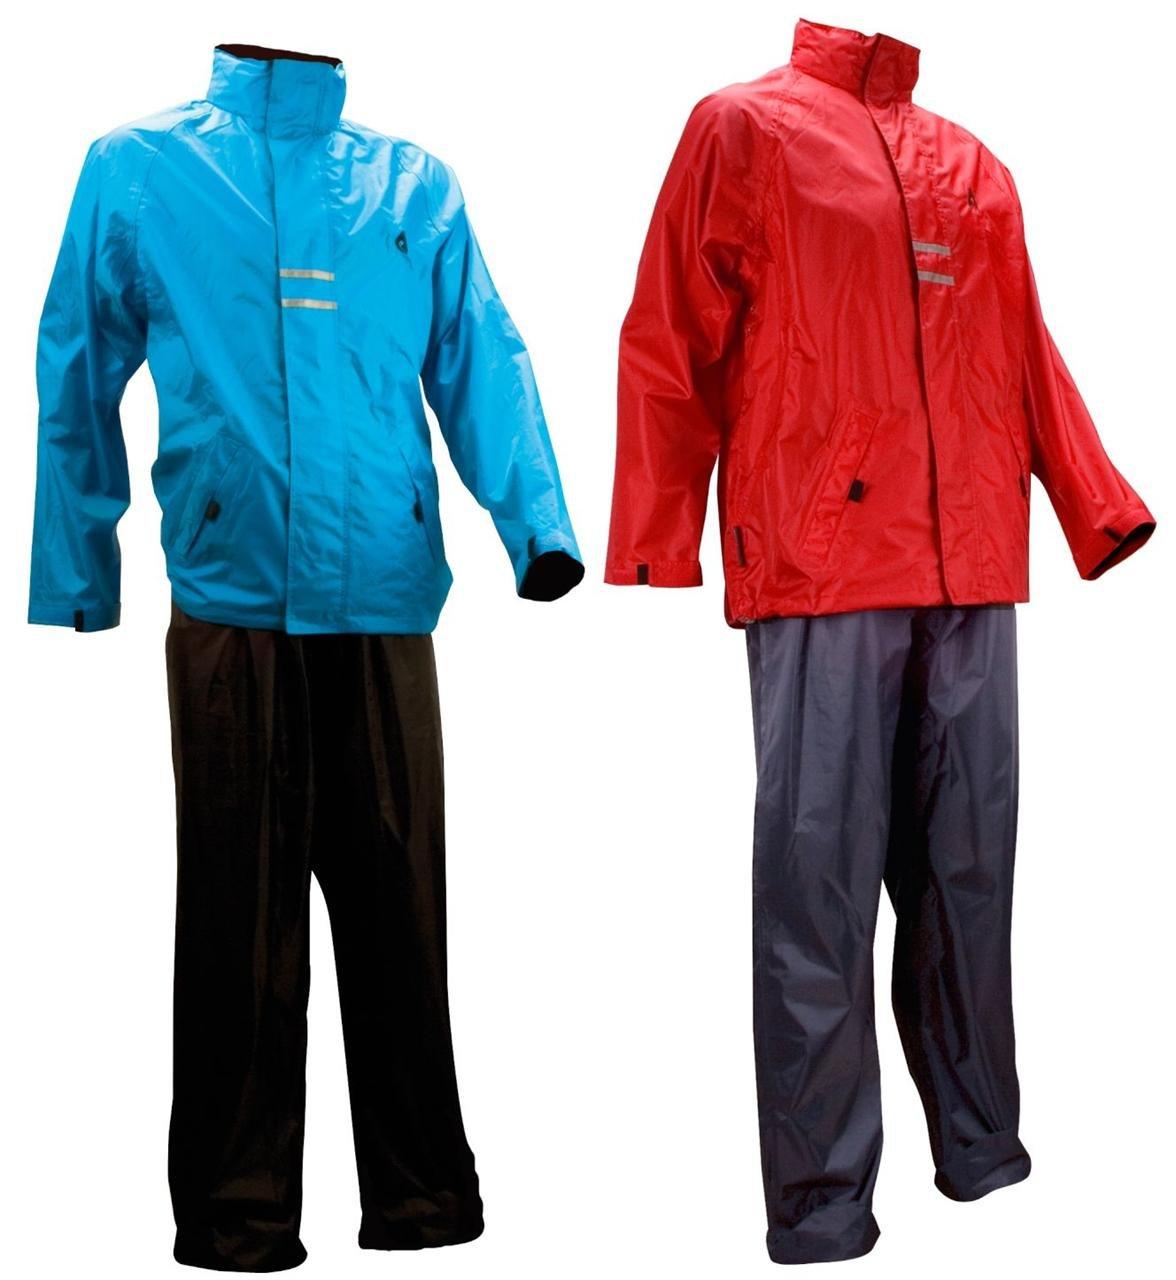 Ralka Regenanzug Senior Regenjacke + Regenhose